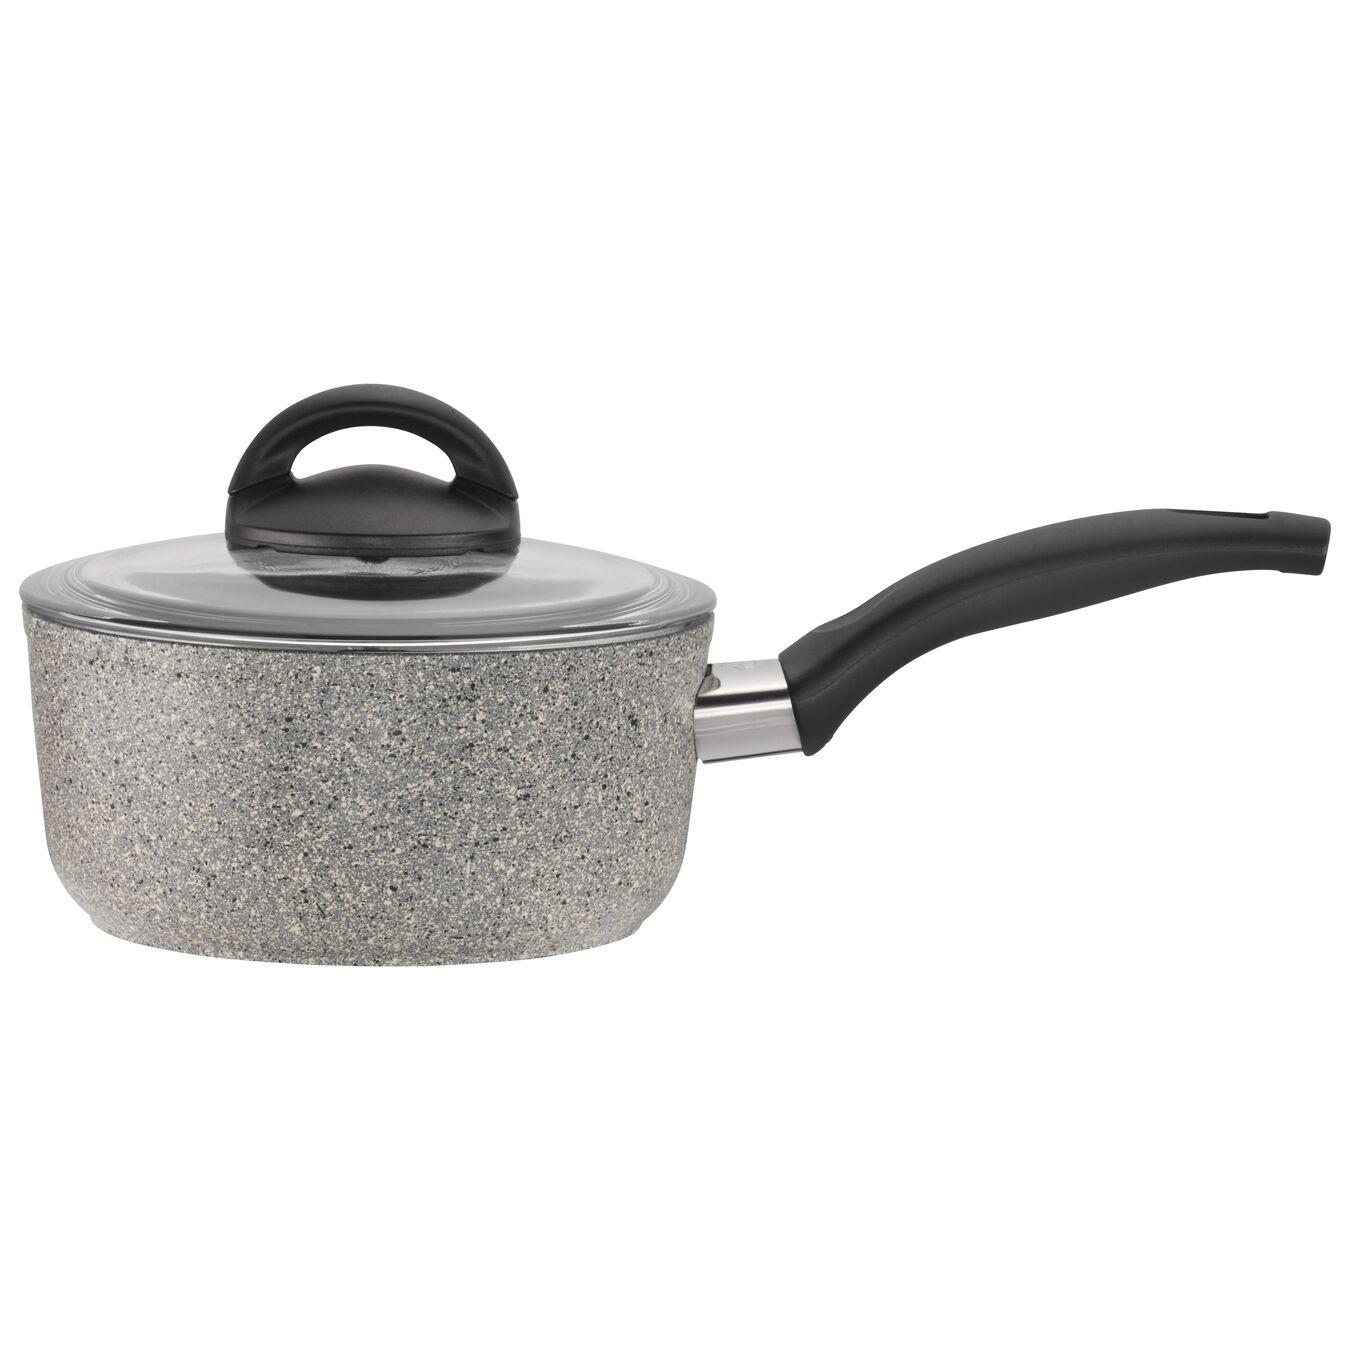 1.5-qt Nonstick Saucepan with Lid,,large 2